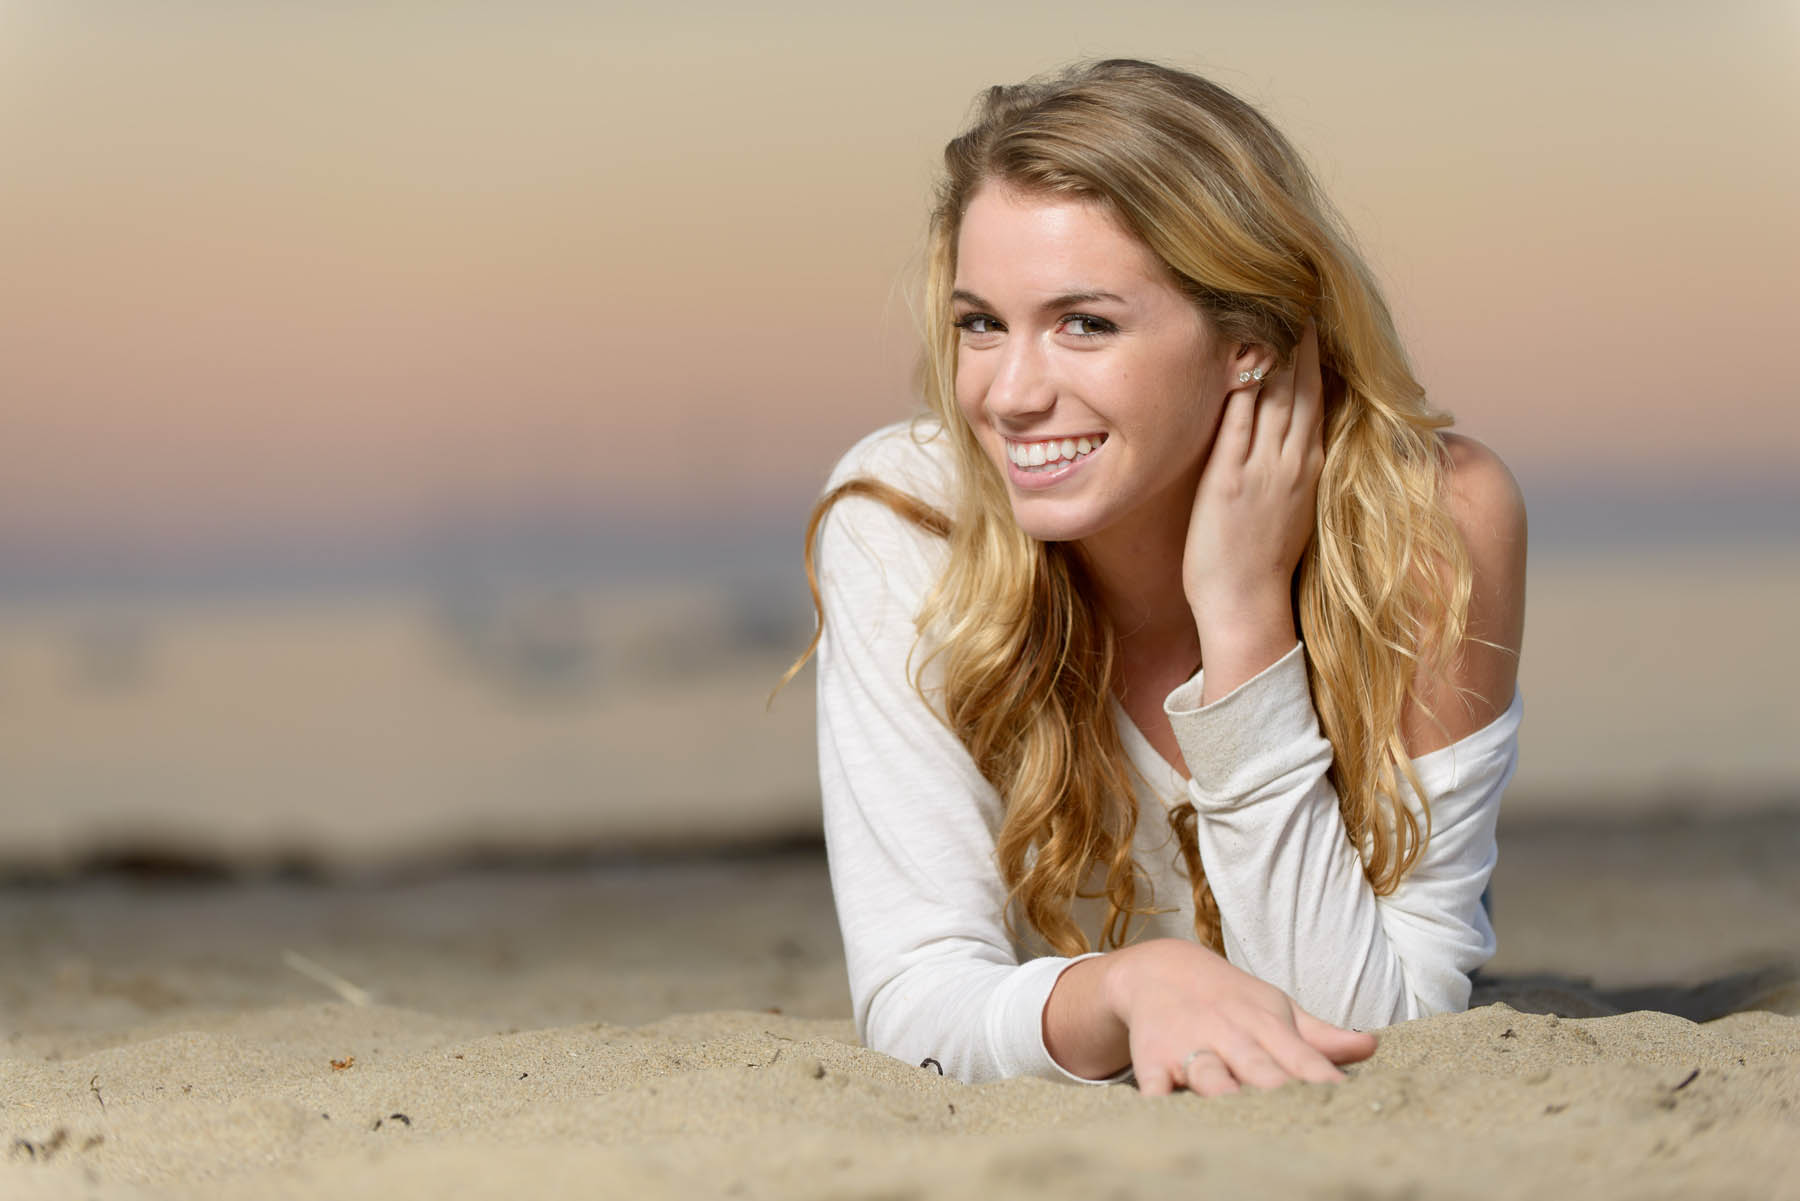 5719_d800b_Jillian_T_Capitola_Beach_Senior_Portrait_Photography.jpg